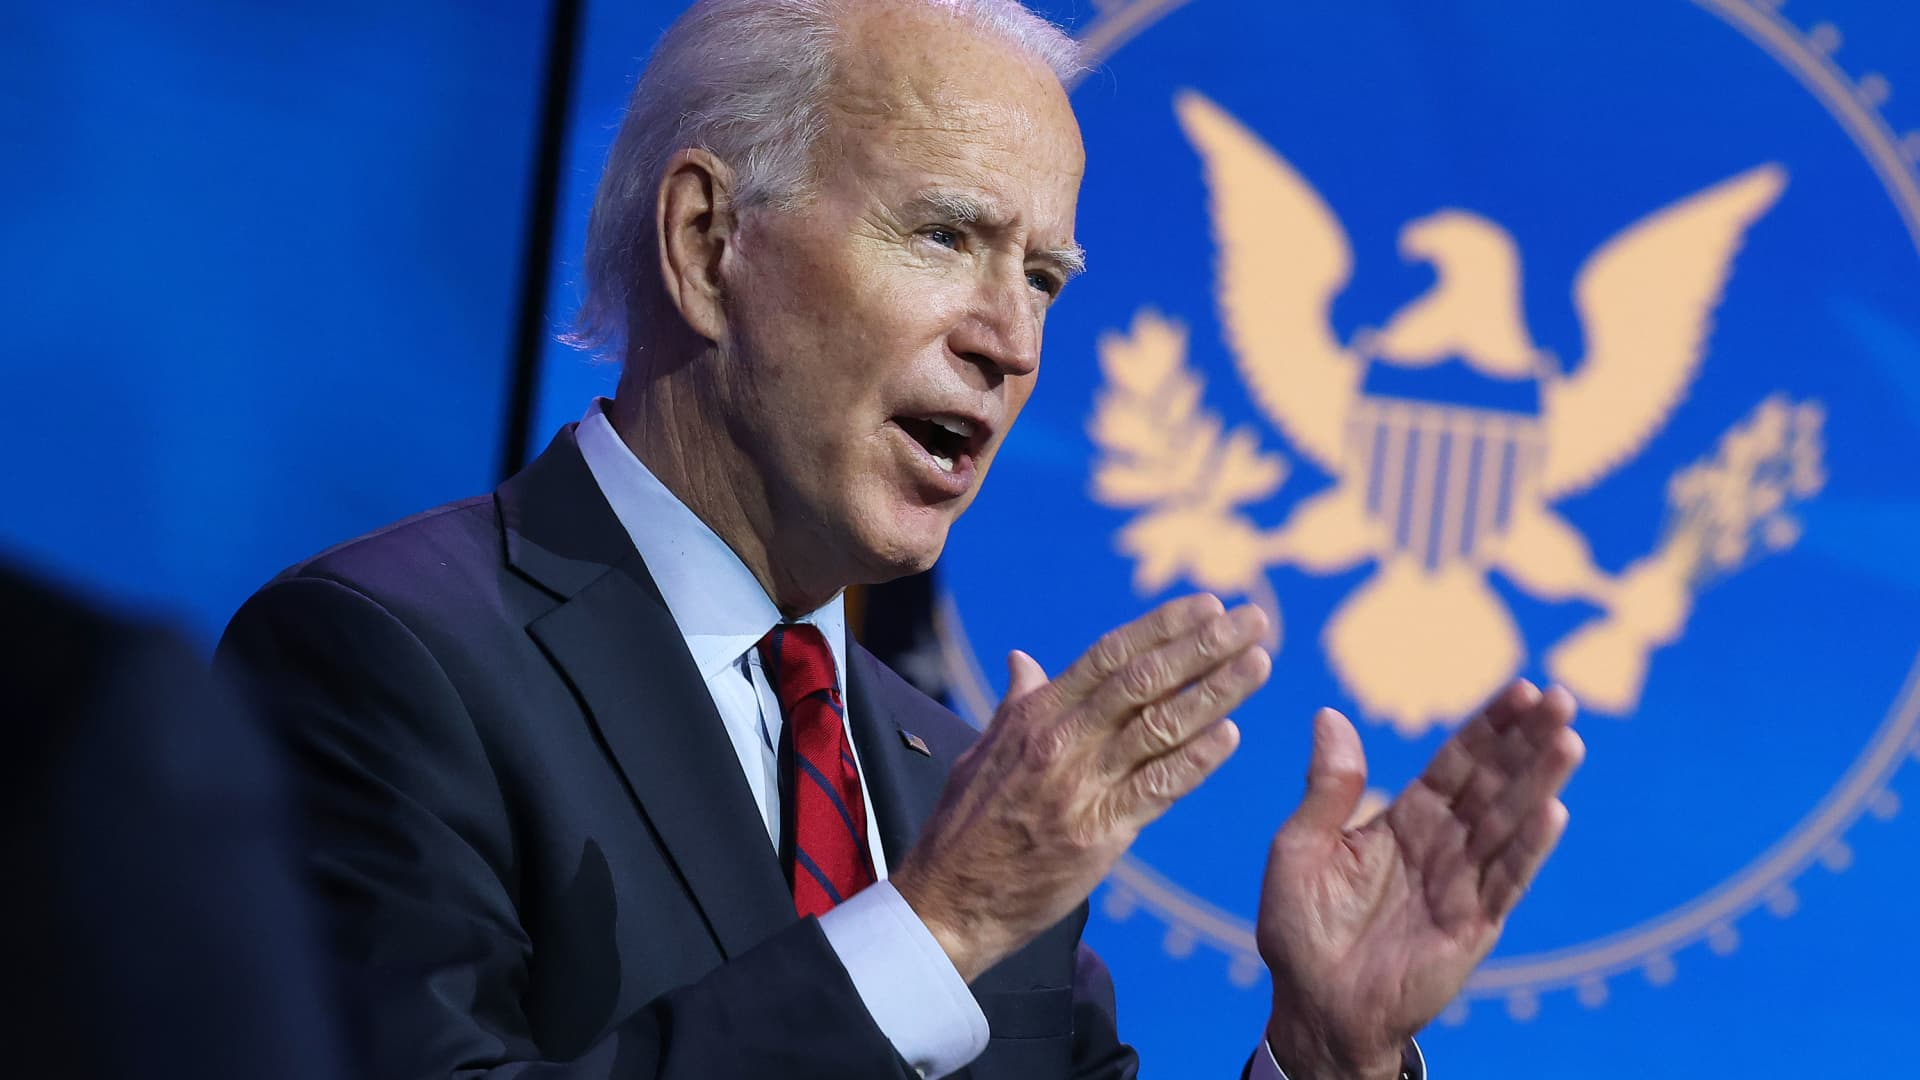 U.S. President-elect Joe Biden announces the members of his health team, at the Queen Theater December 08, 2020 in Wilmington, Delaware.